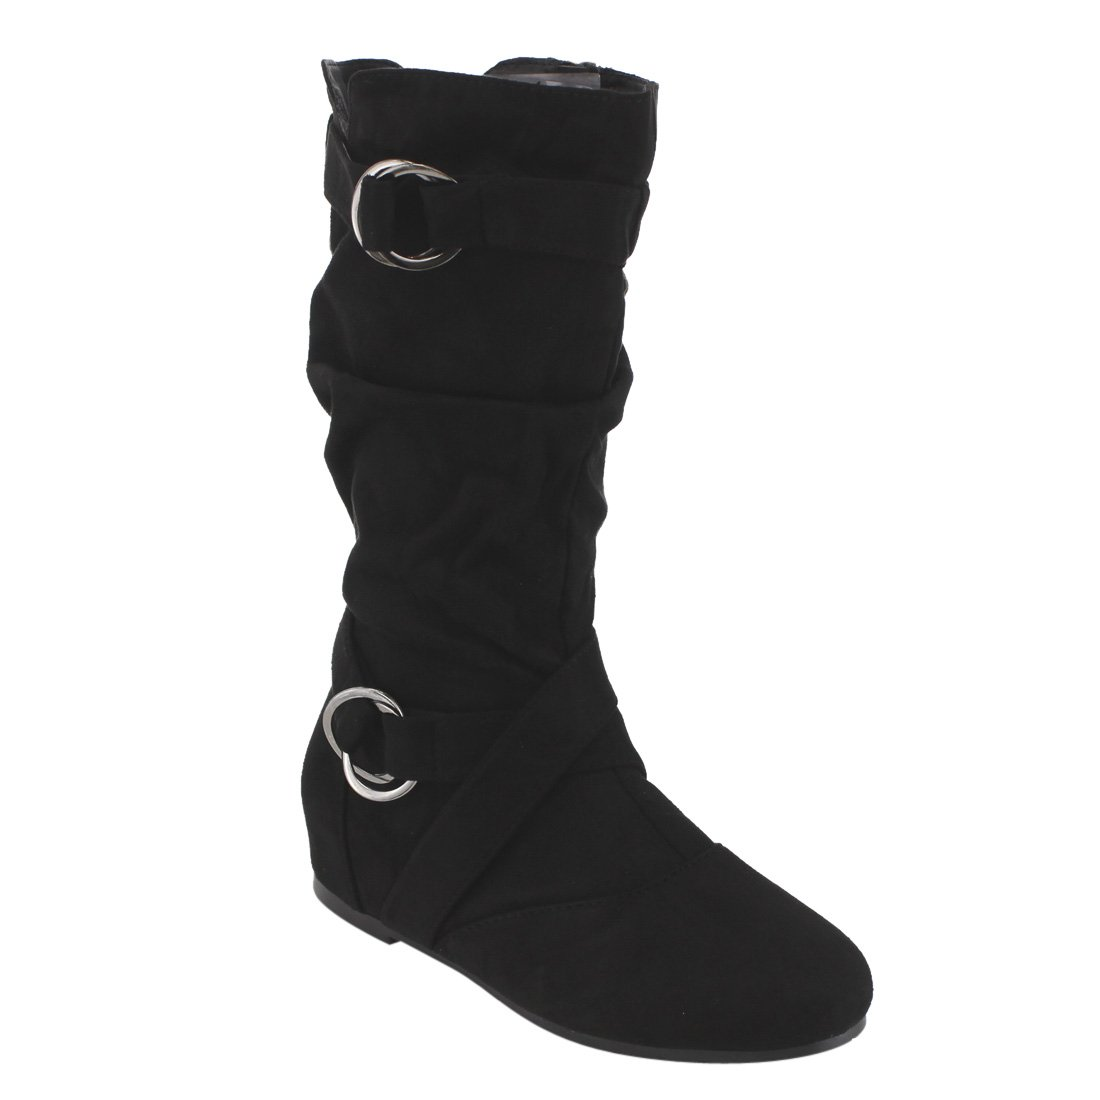 Forever Kayden-84 Women's Cut Out Side Zipper Strap Buckle Flat Heel Slouchy Boots,Black,5